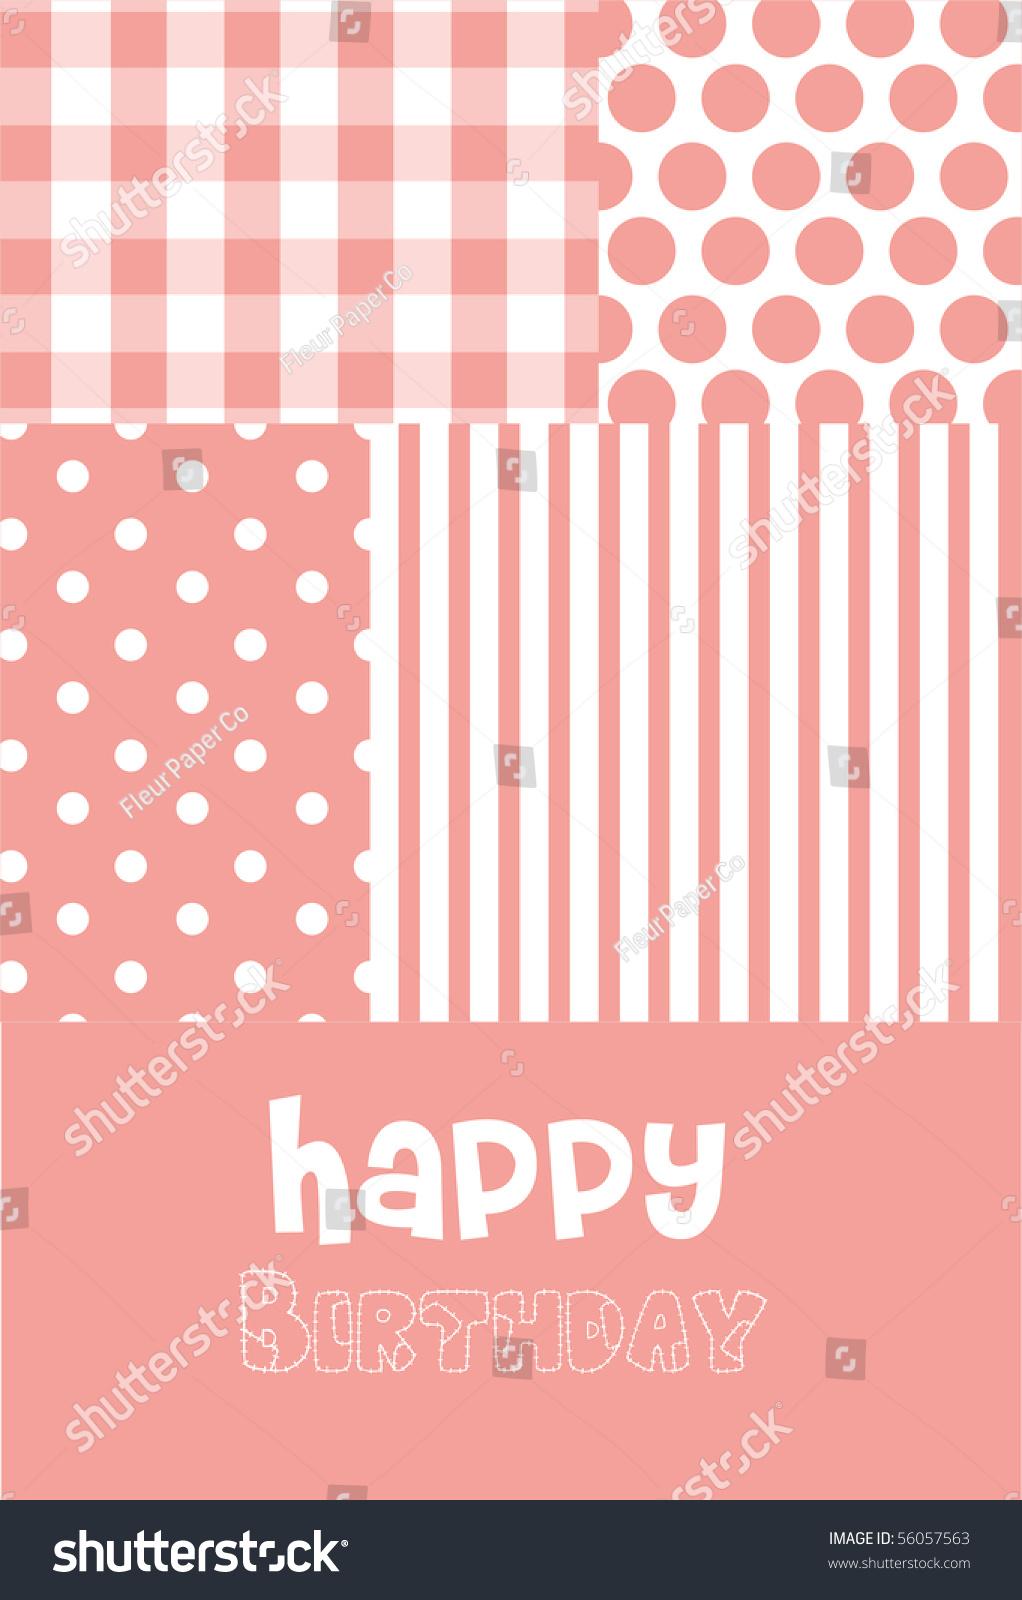 Baby girl birth announcement birthday greeting stock vector 56057563 baby girl birth announcement or birthday greeting card m4hsunfo